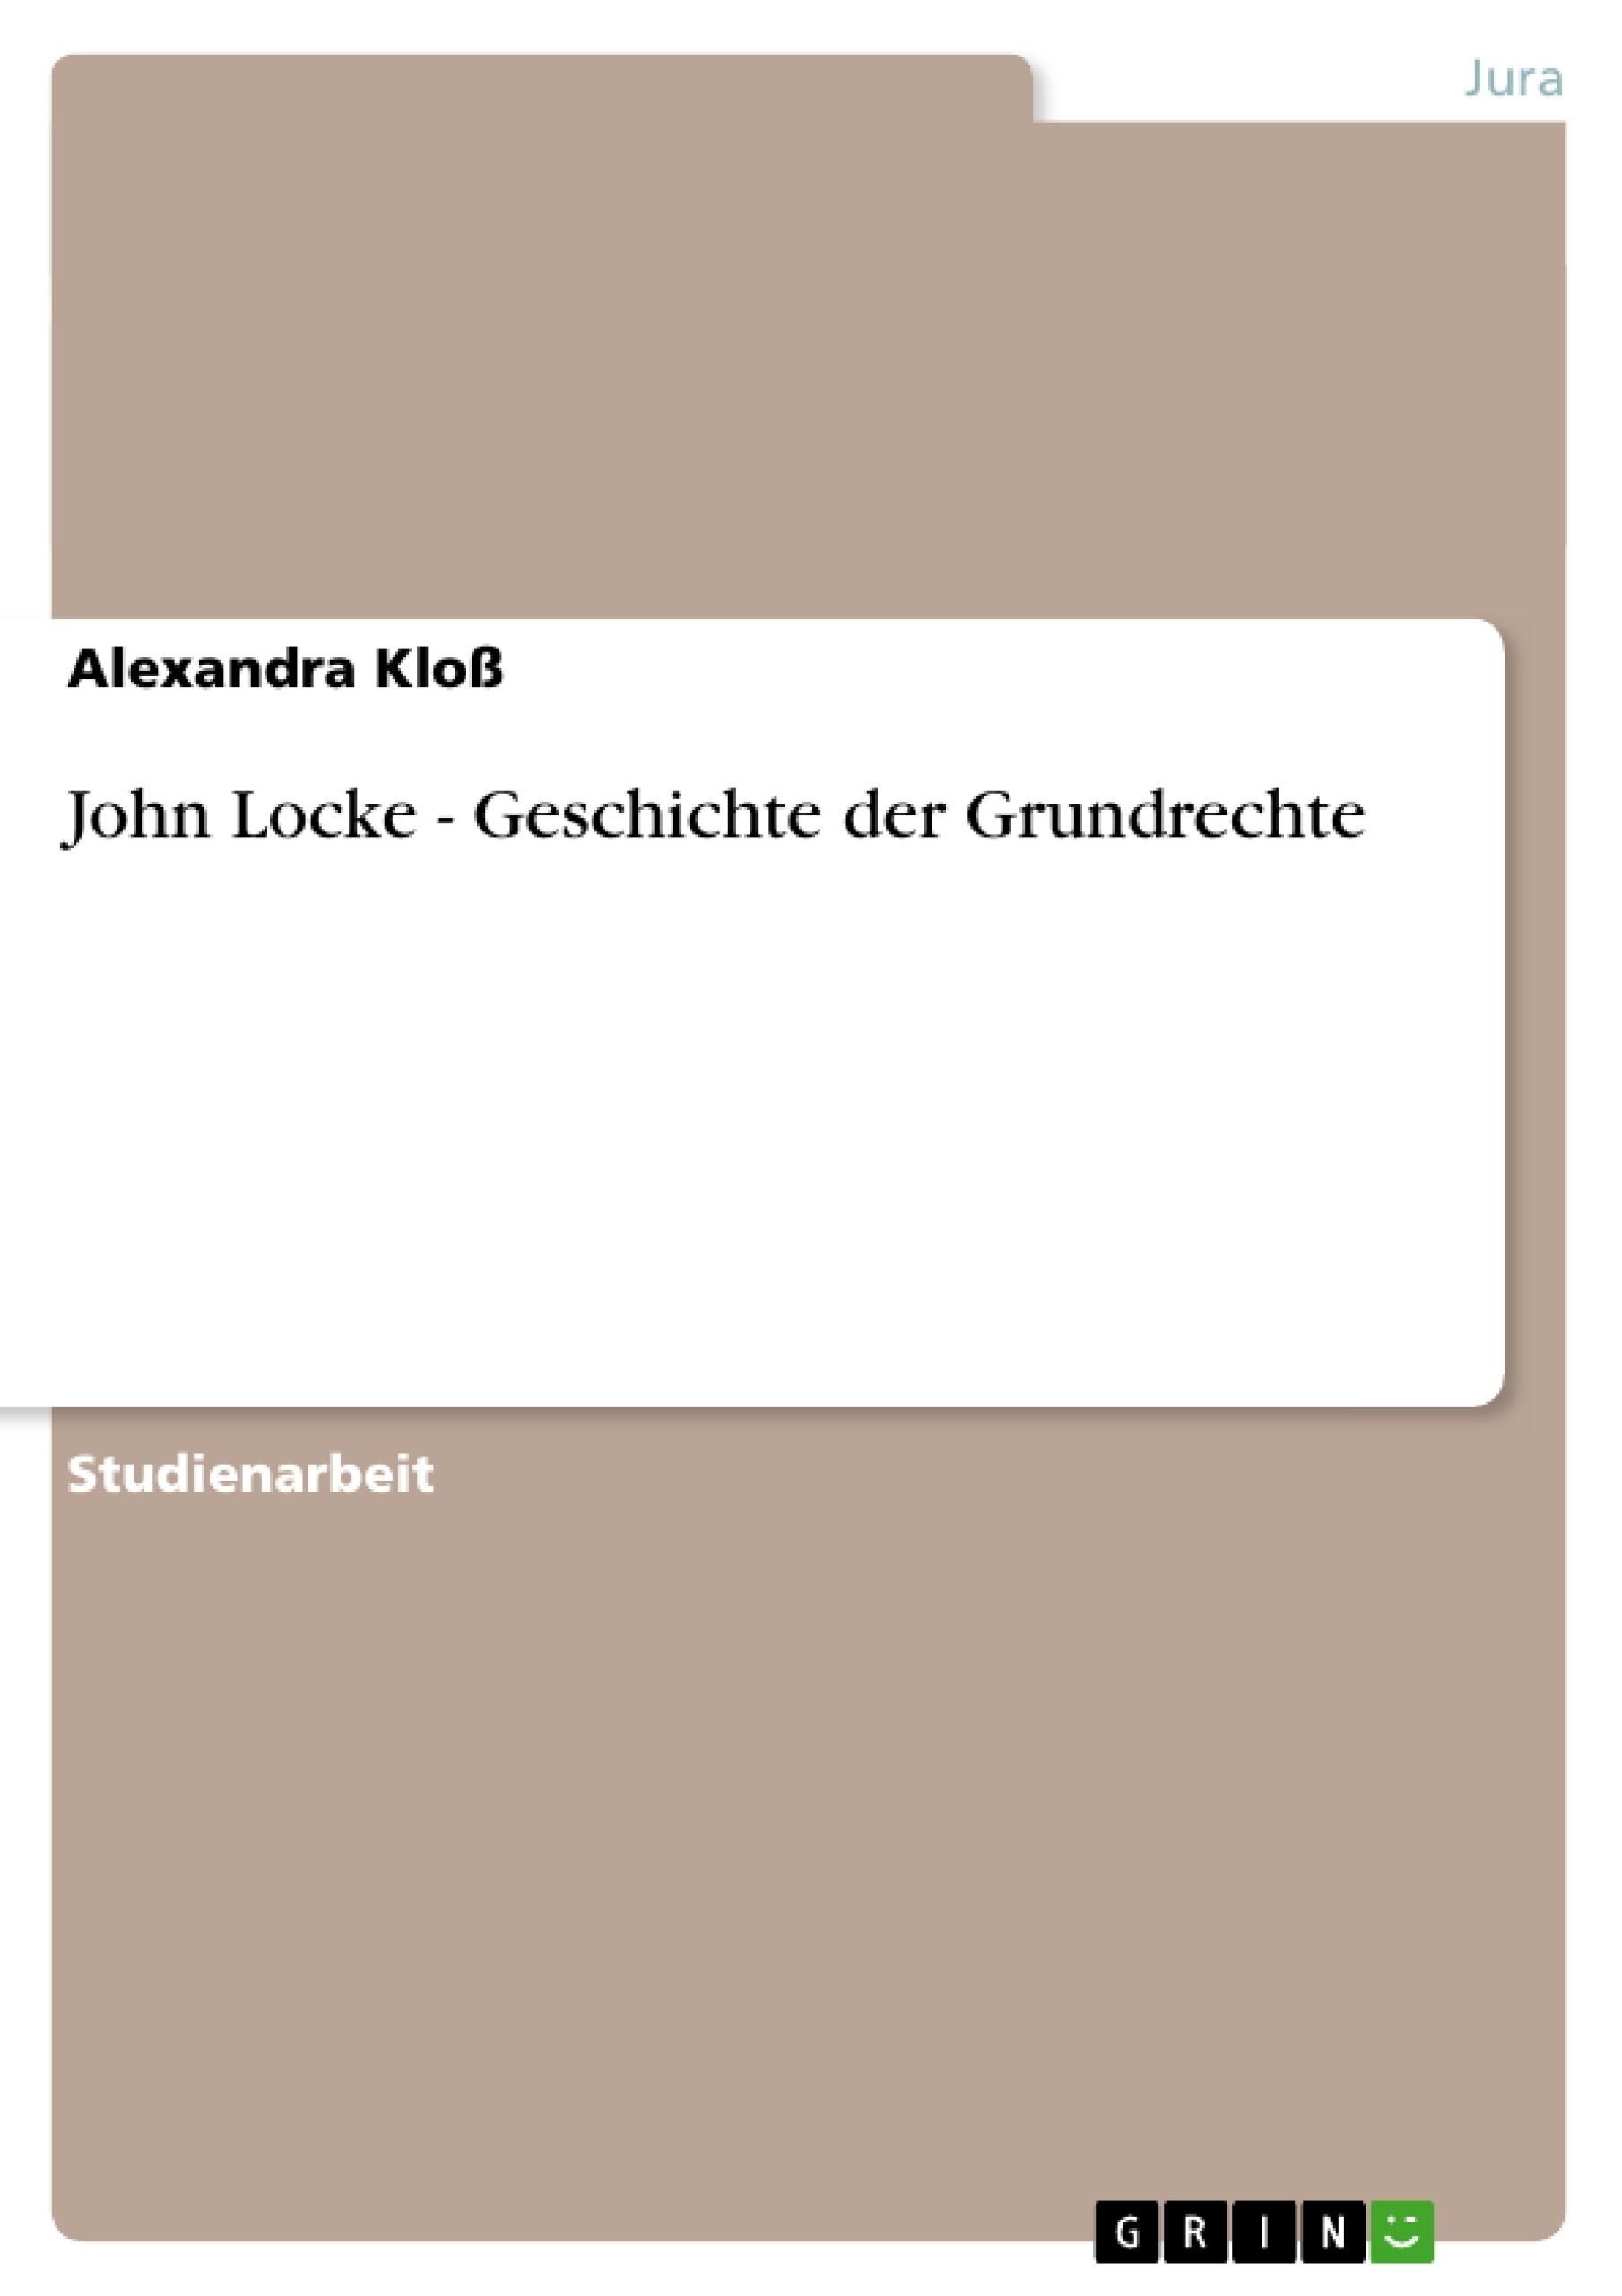 Titel: John Locke - Geschichte der Grundrechte